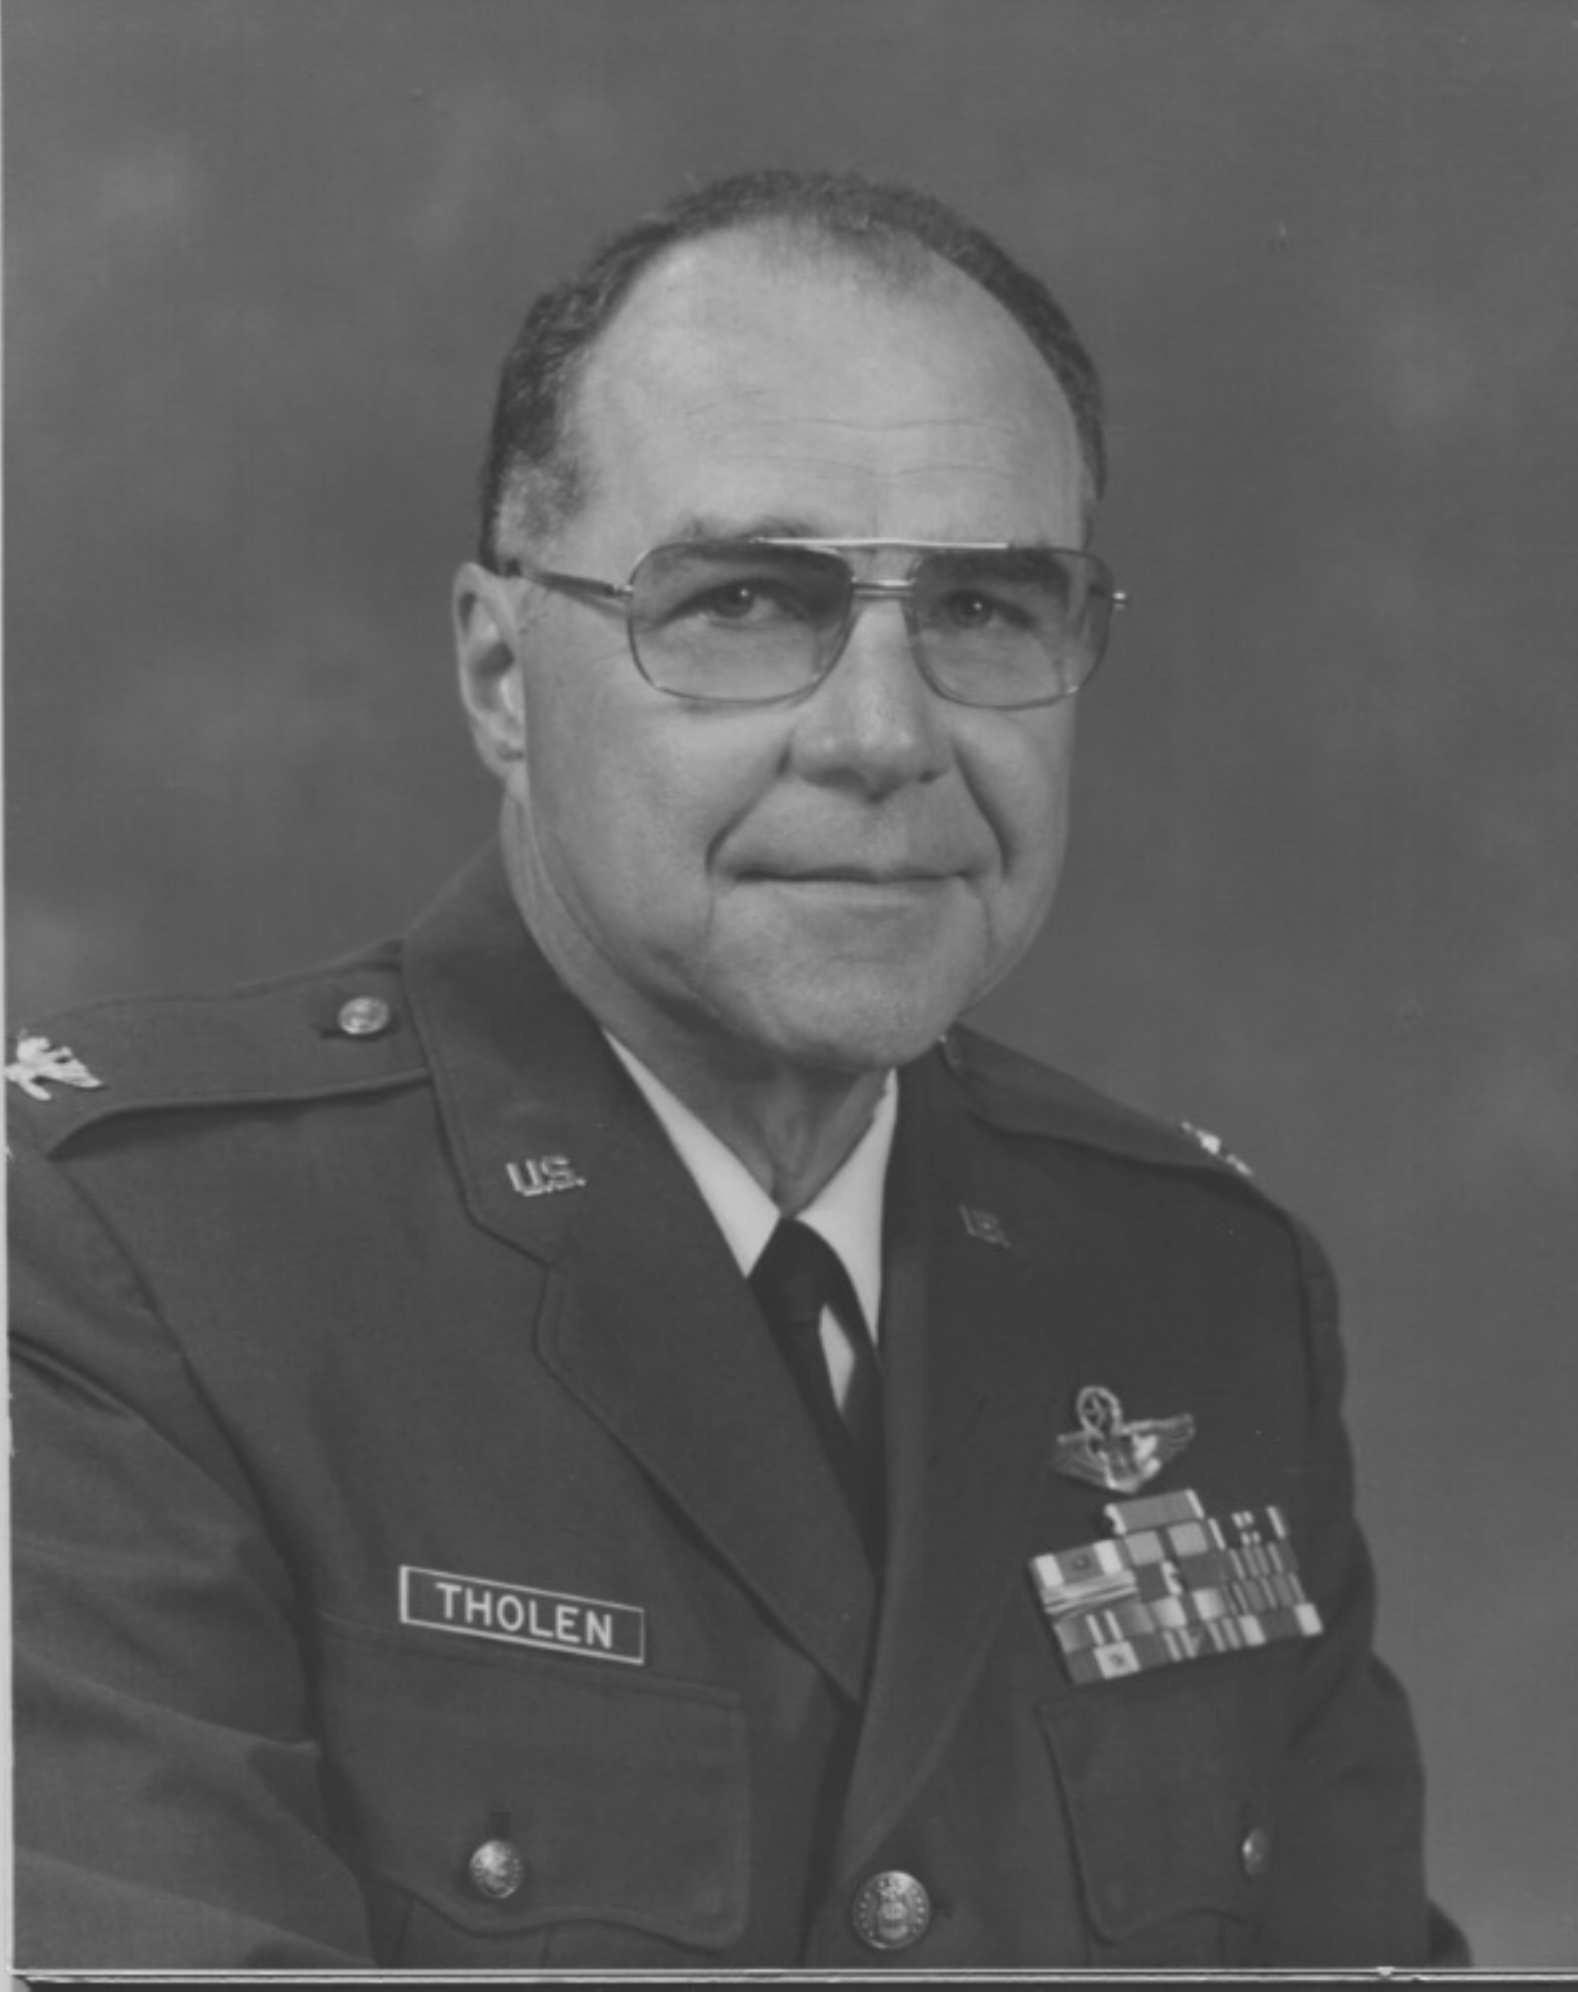 Tholen, Colonel Lloyd Arnold